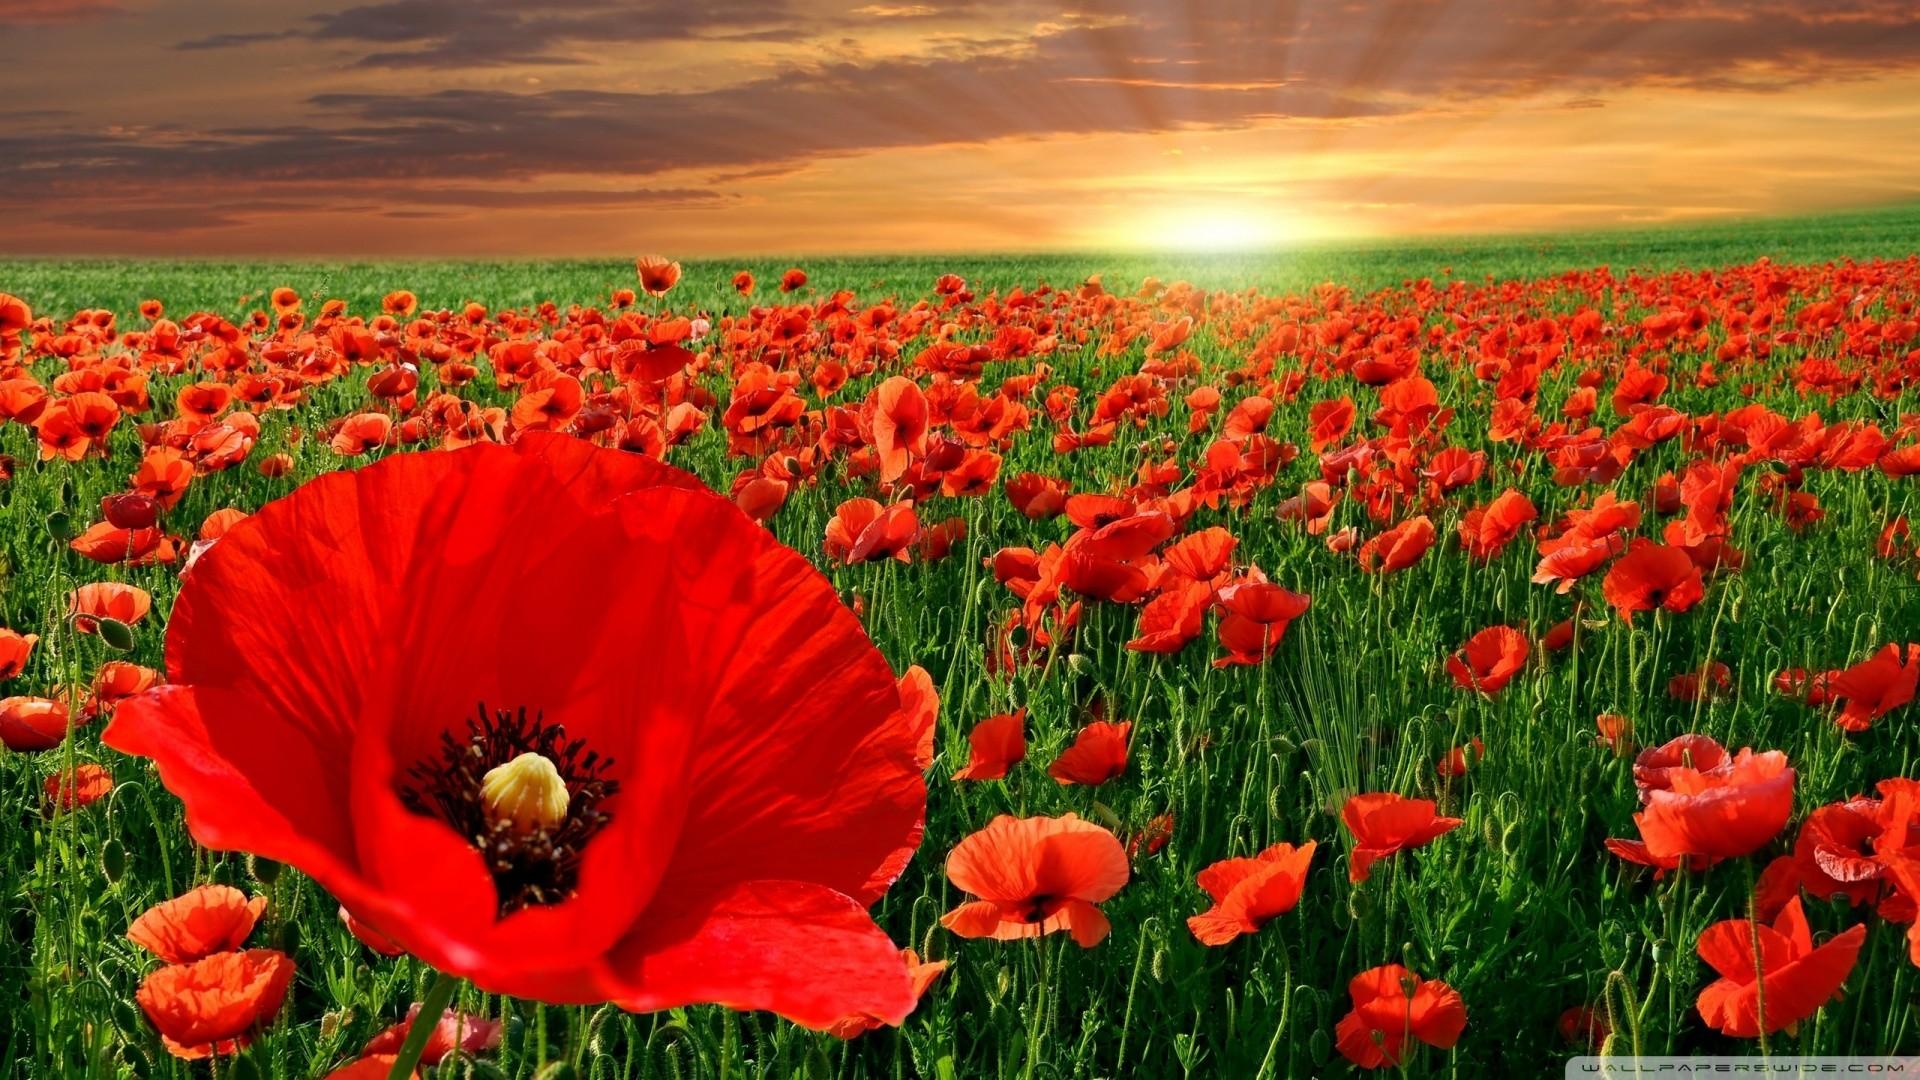 Sunset Poppy Field Wallpaper Sunset, Poppy, Field